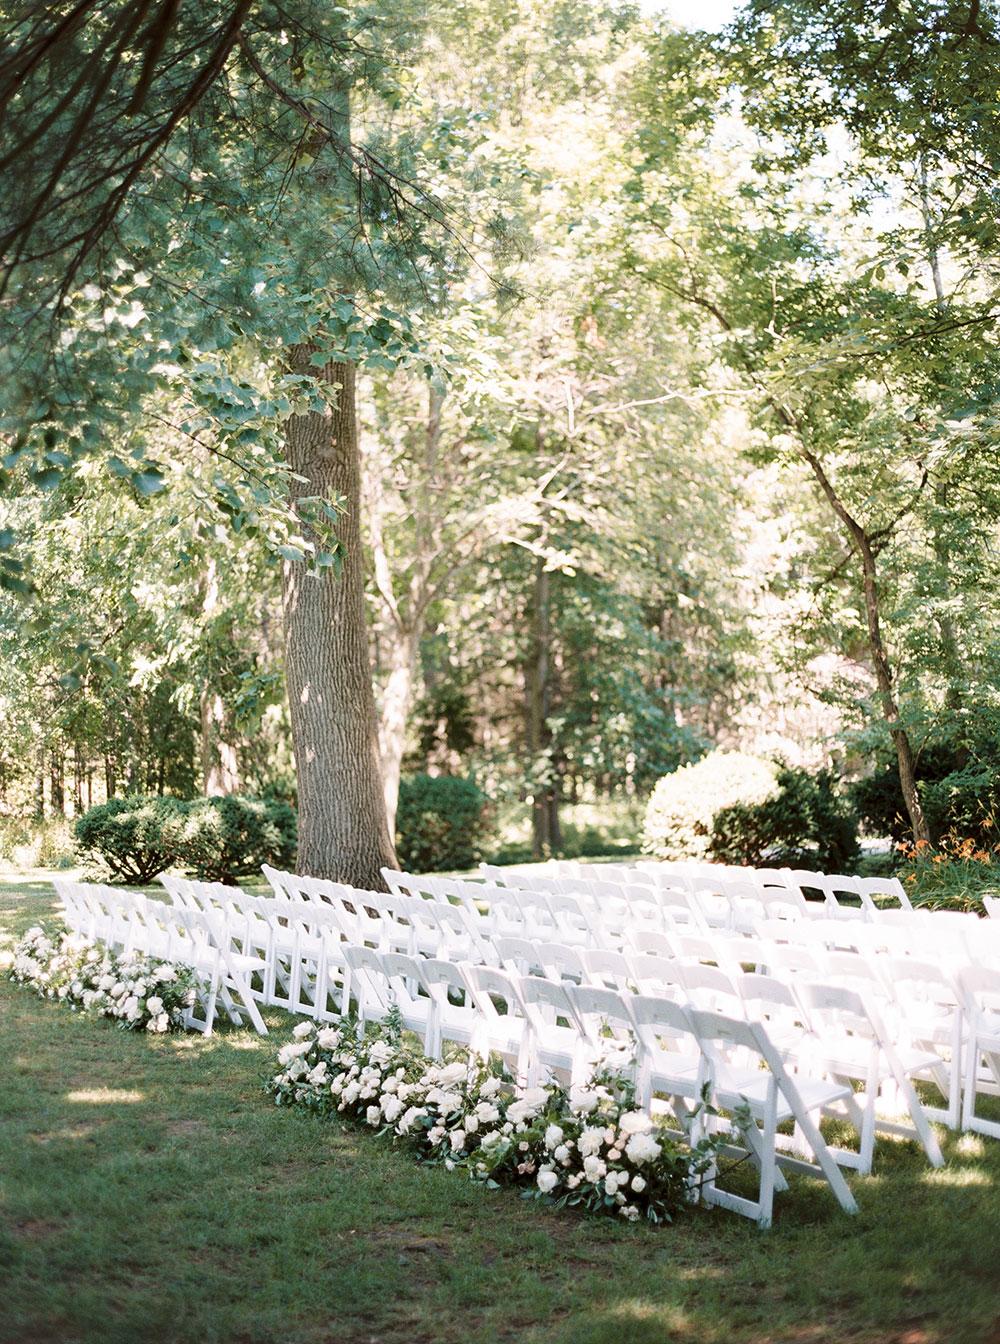 kurtz-orchards-wedding-gracewood-estate-niagara-on-the-lake-photo-by-katie-nicolle-photography-0018.JPG